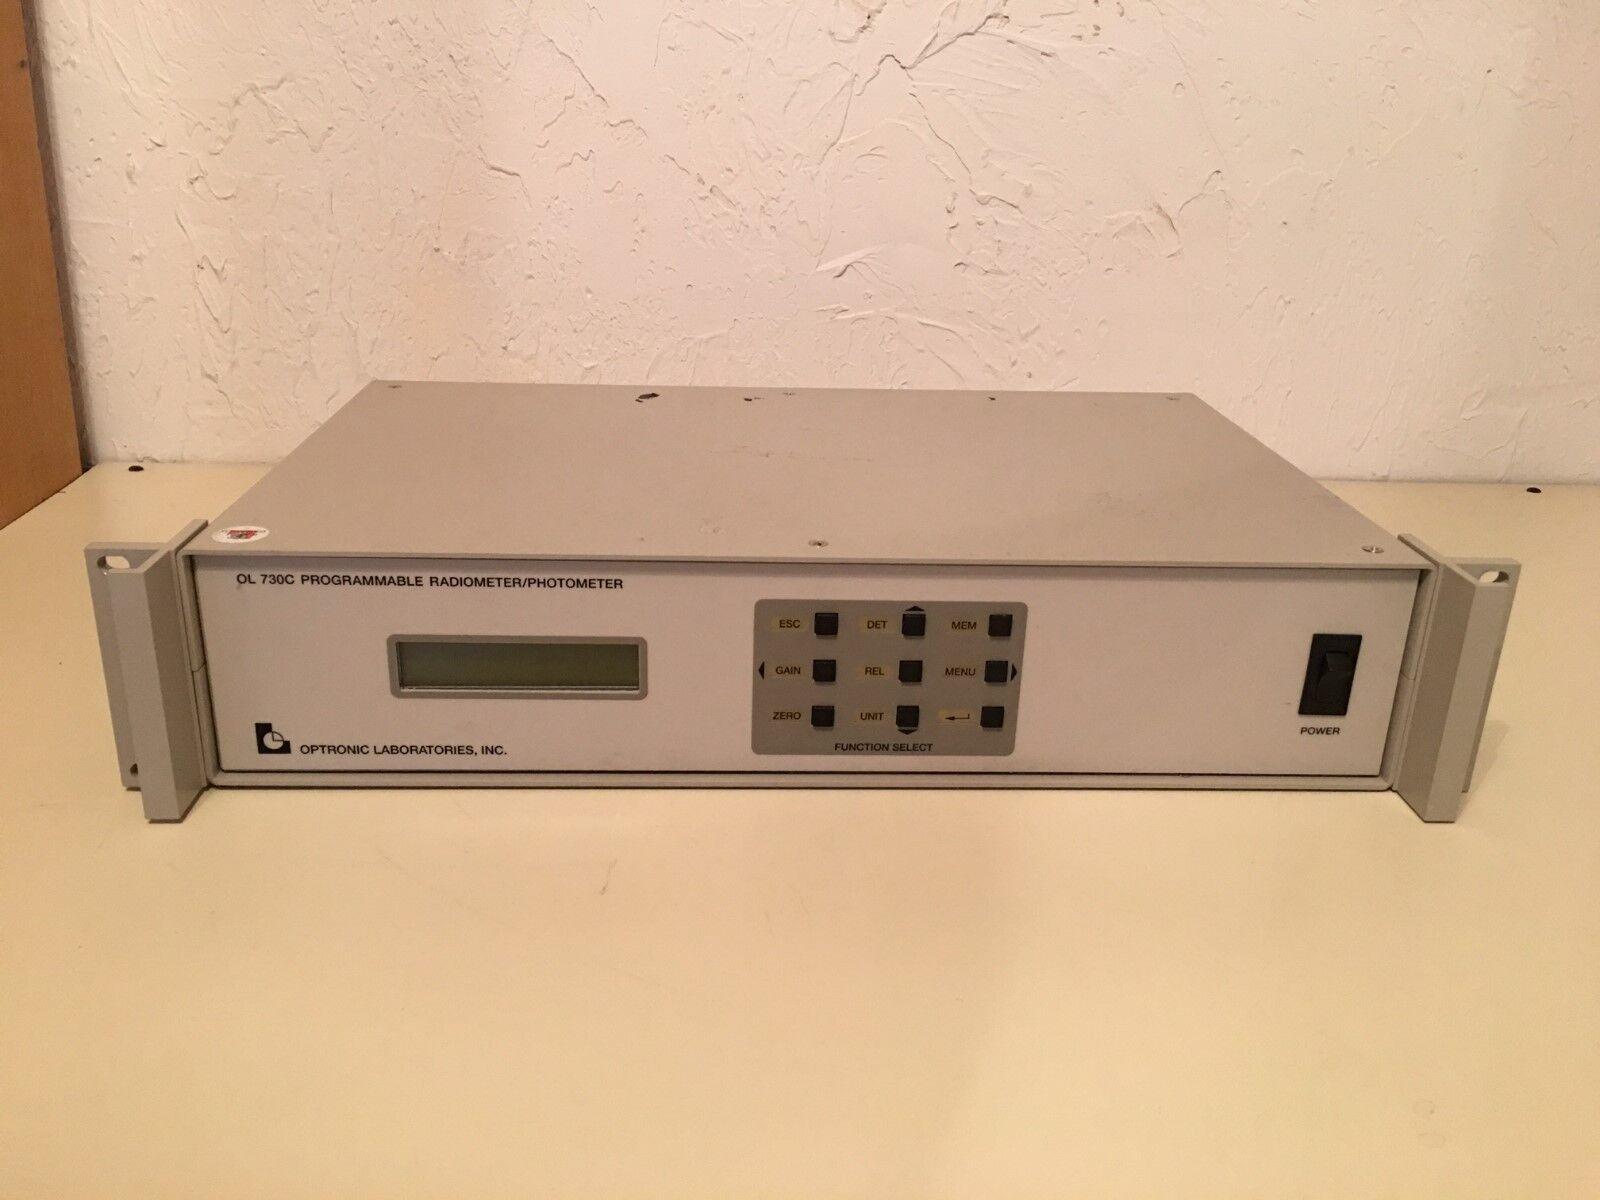 Optronic Laboratories 730C Programmable Radiometer/Photometer